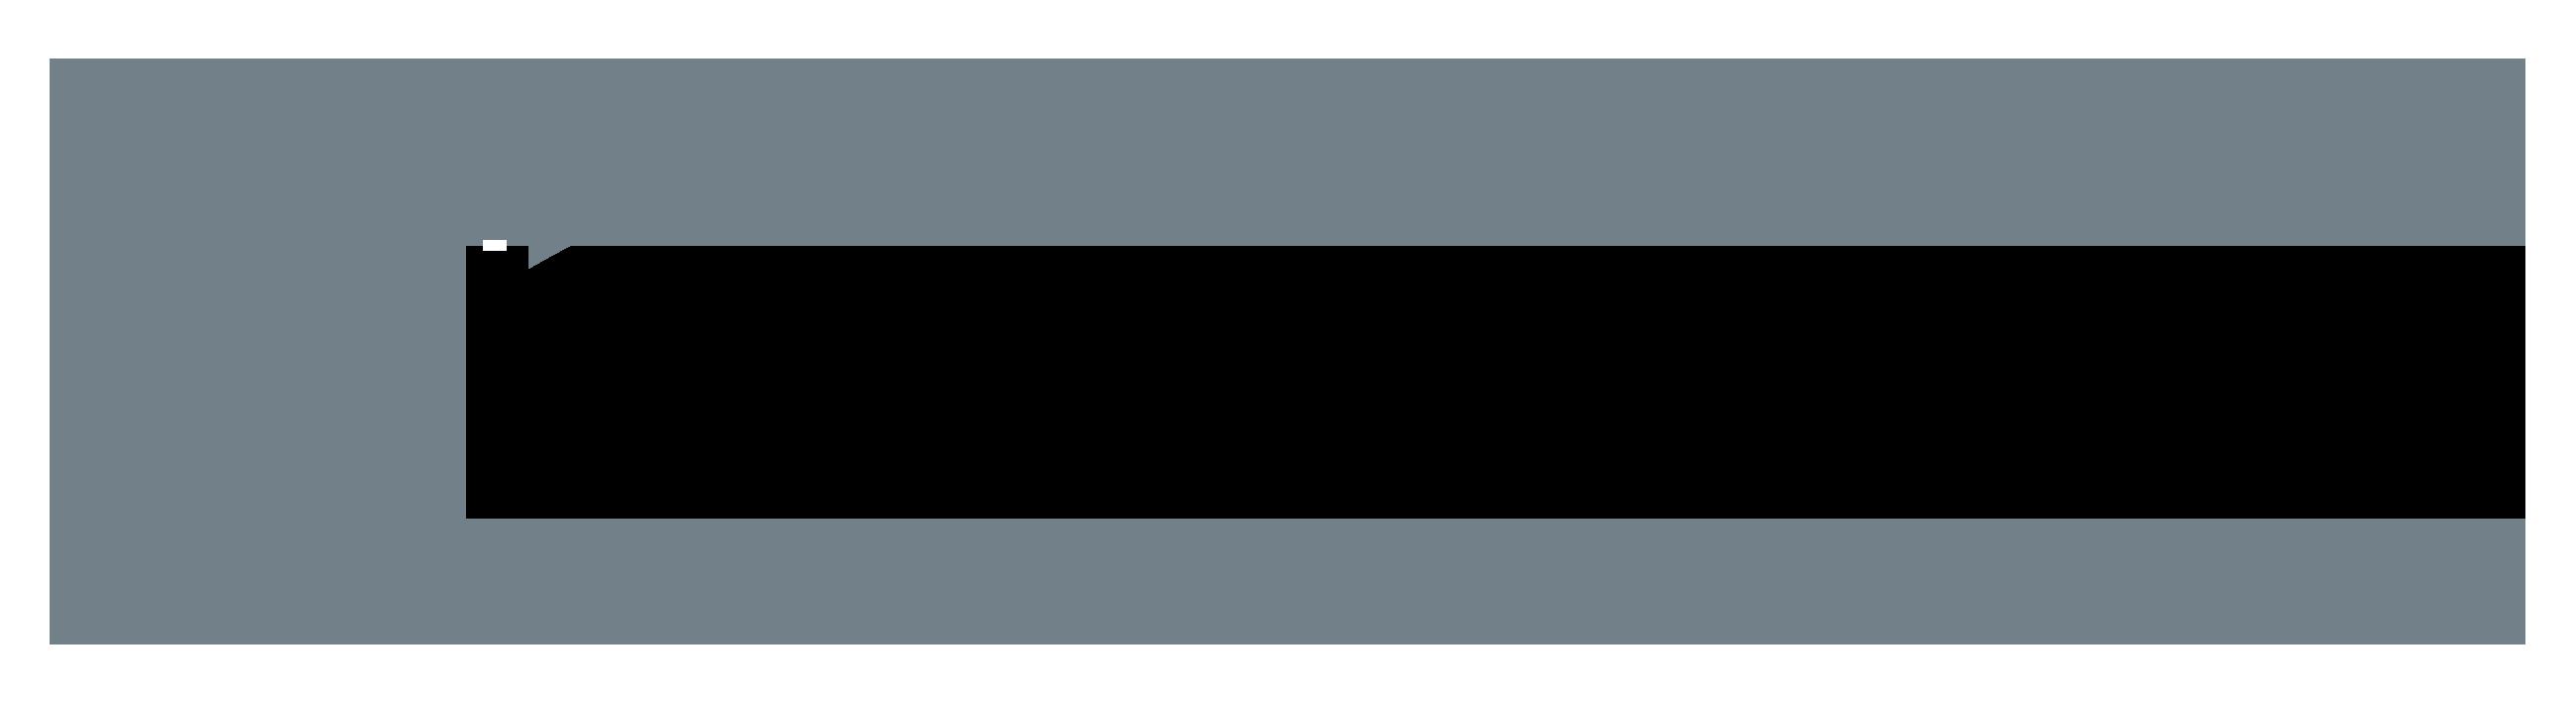 INSPIRATION HEALTHCARE GROUP PLC Logo